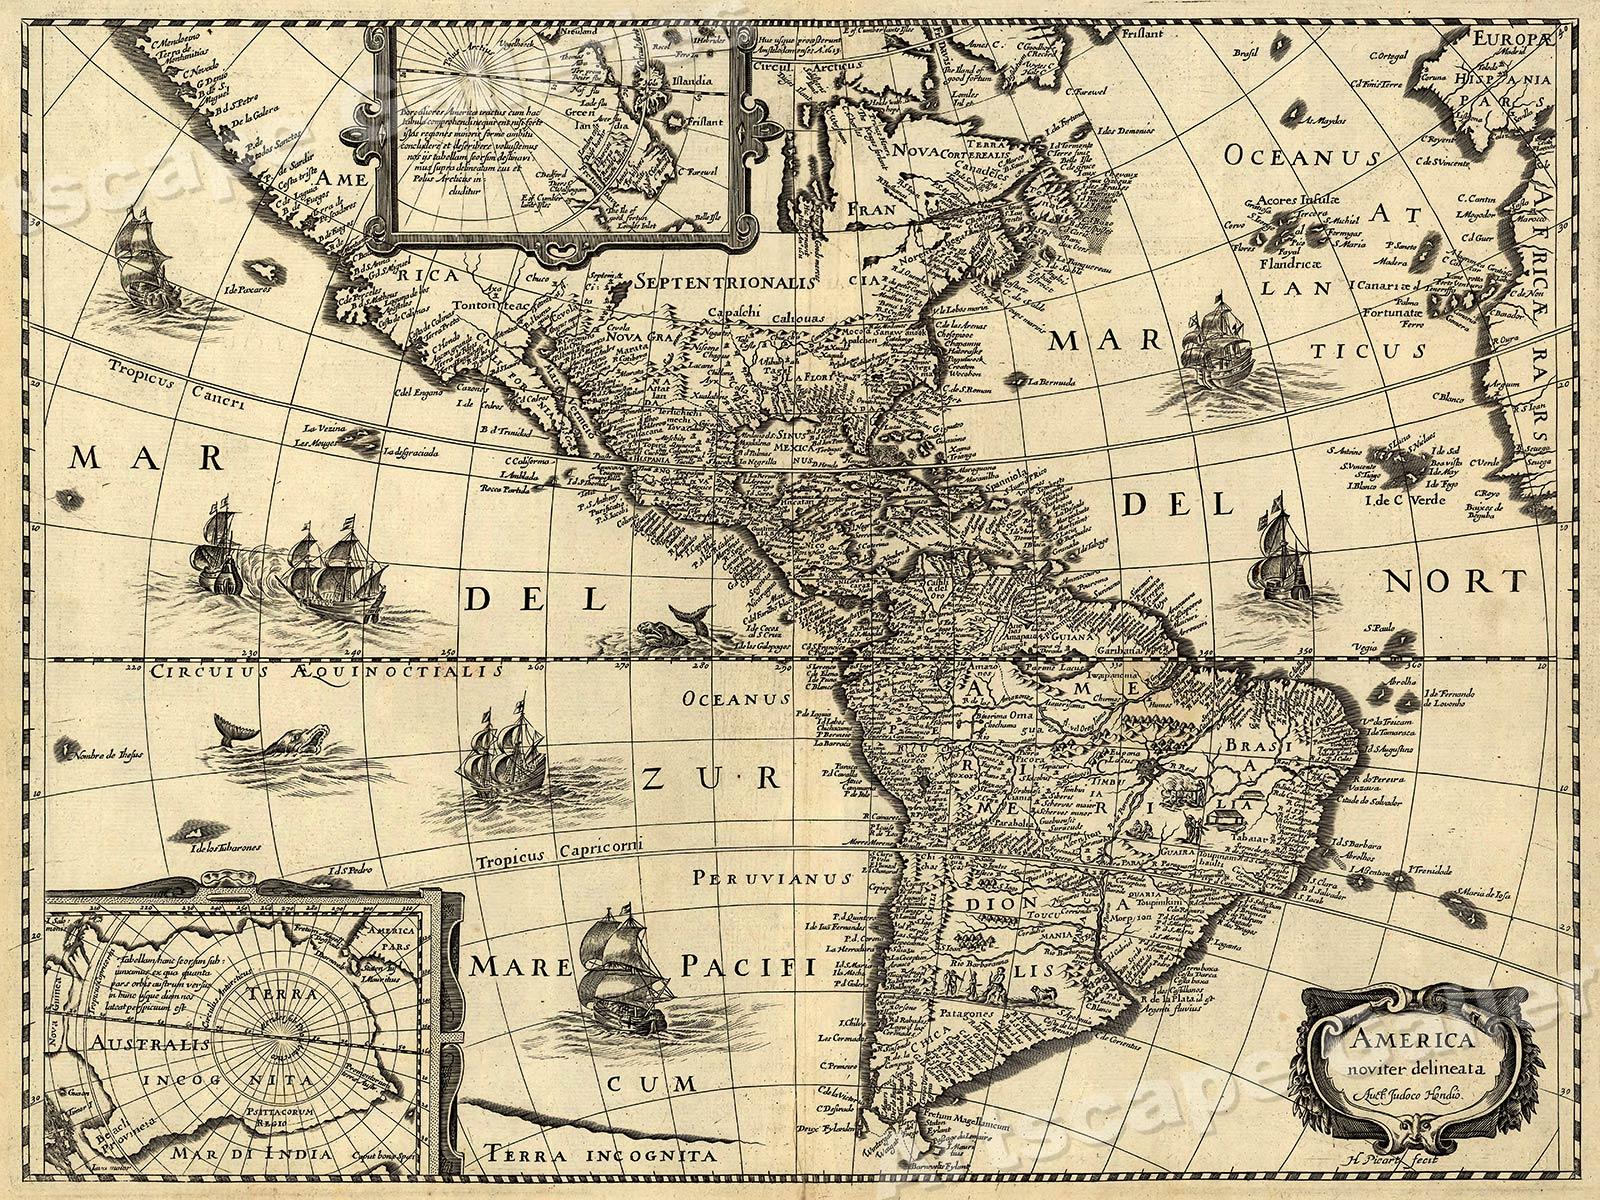 18x24 1640 America New World Western Hemisphere Historic Map